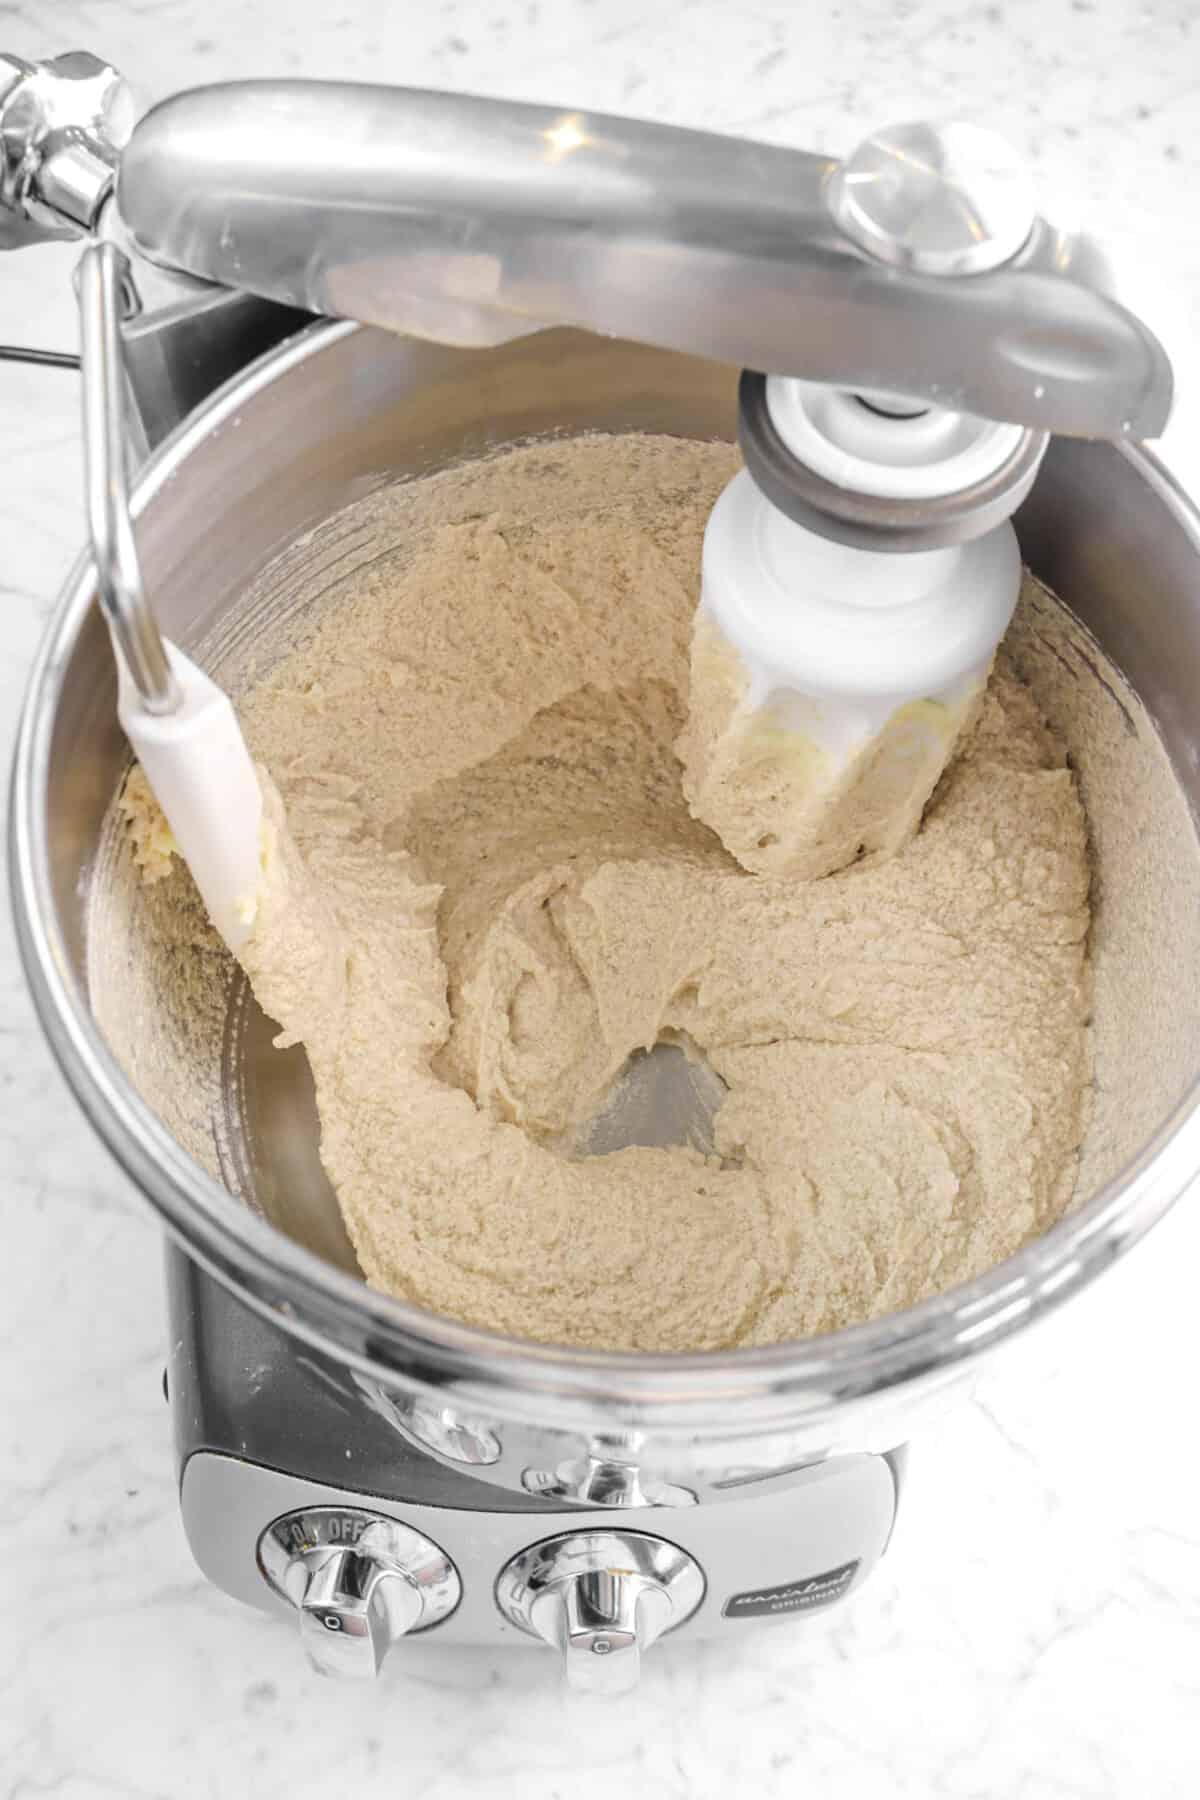 buttermilk stirred into butter mixture